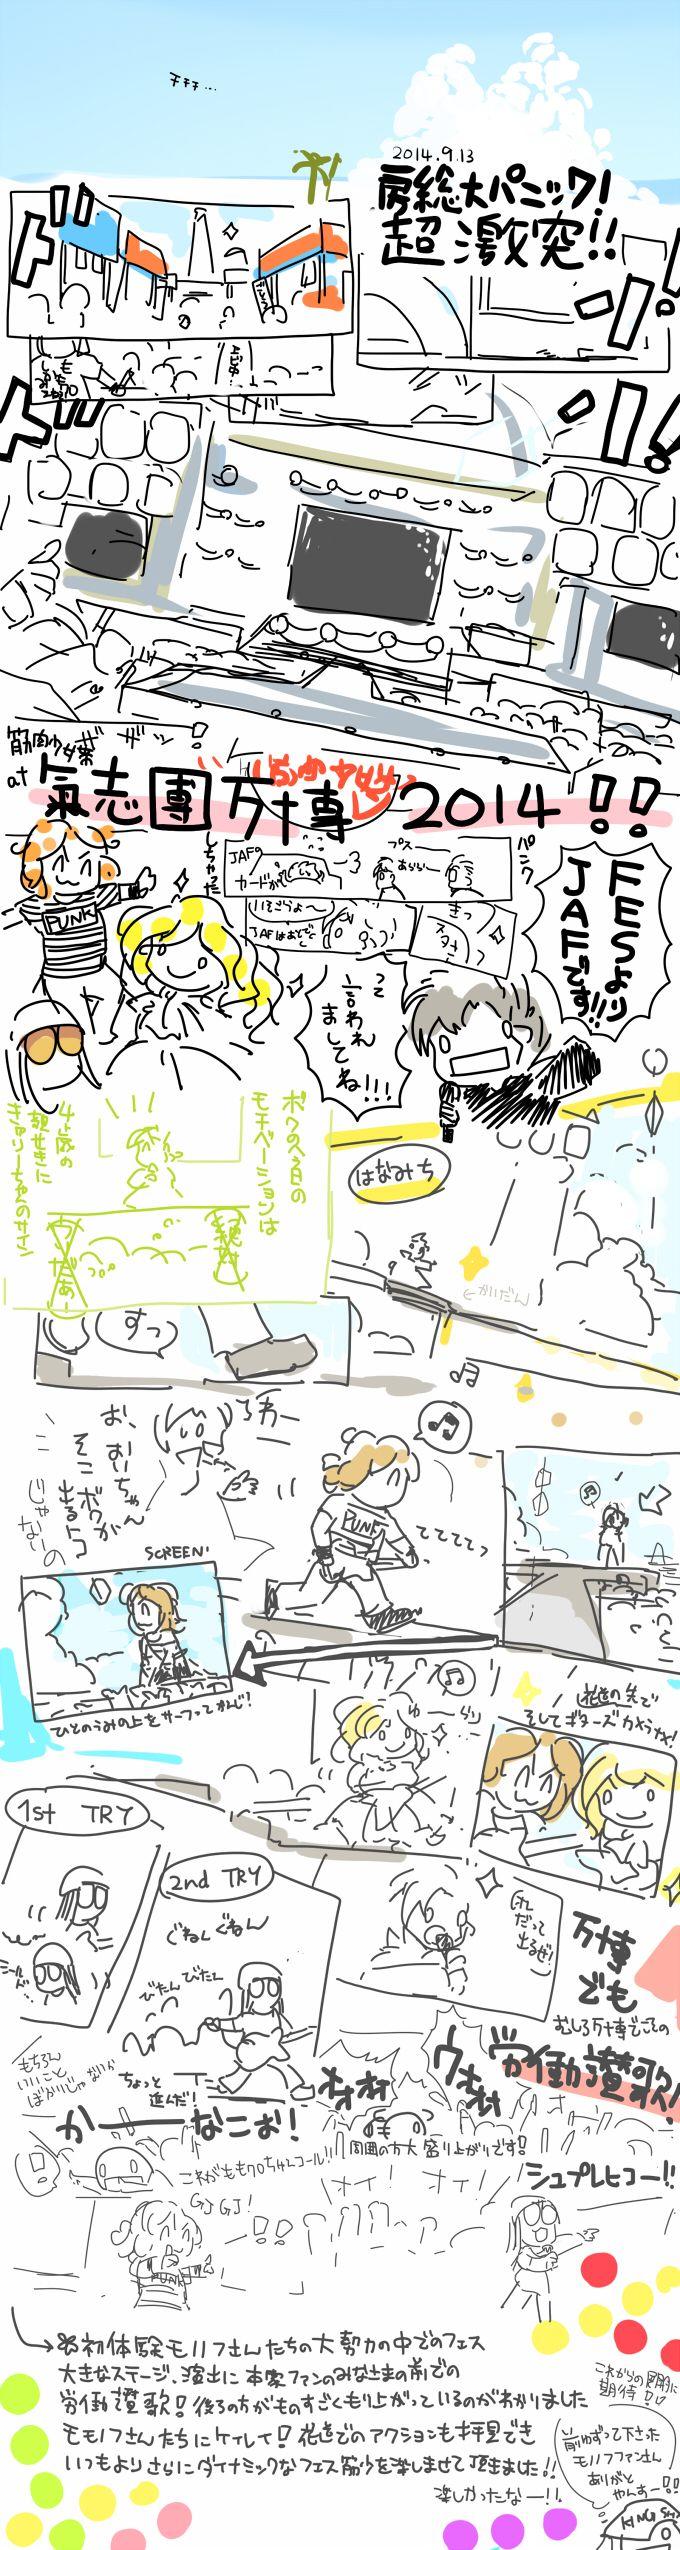 2014/9/13 「氣志團万博2014~房総大パニック!超激突!!」@袖ヶ浜海浜公園